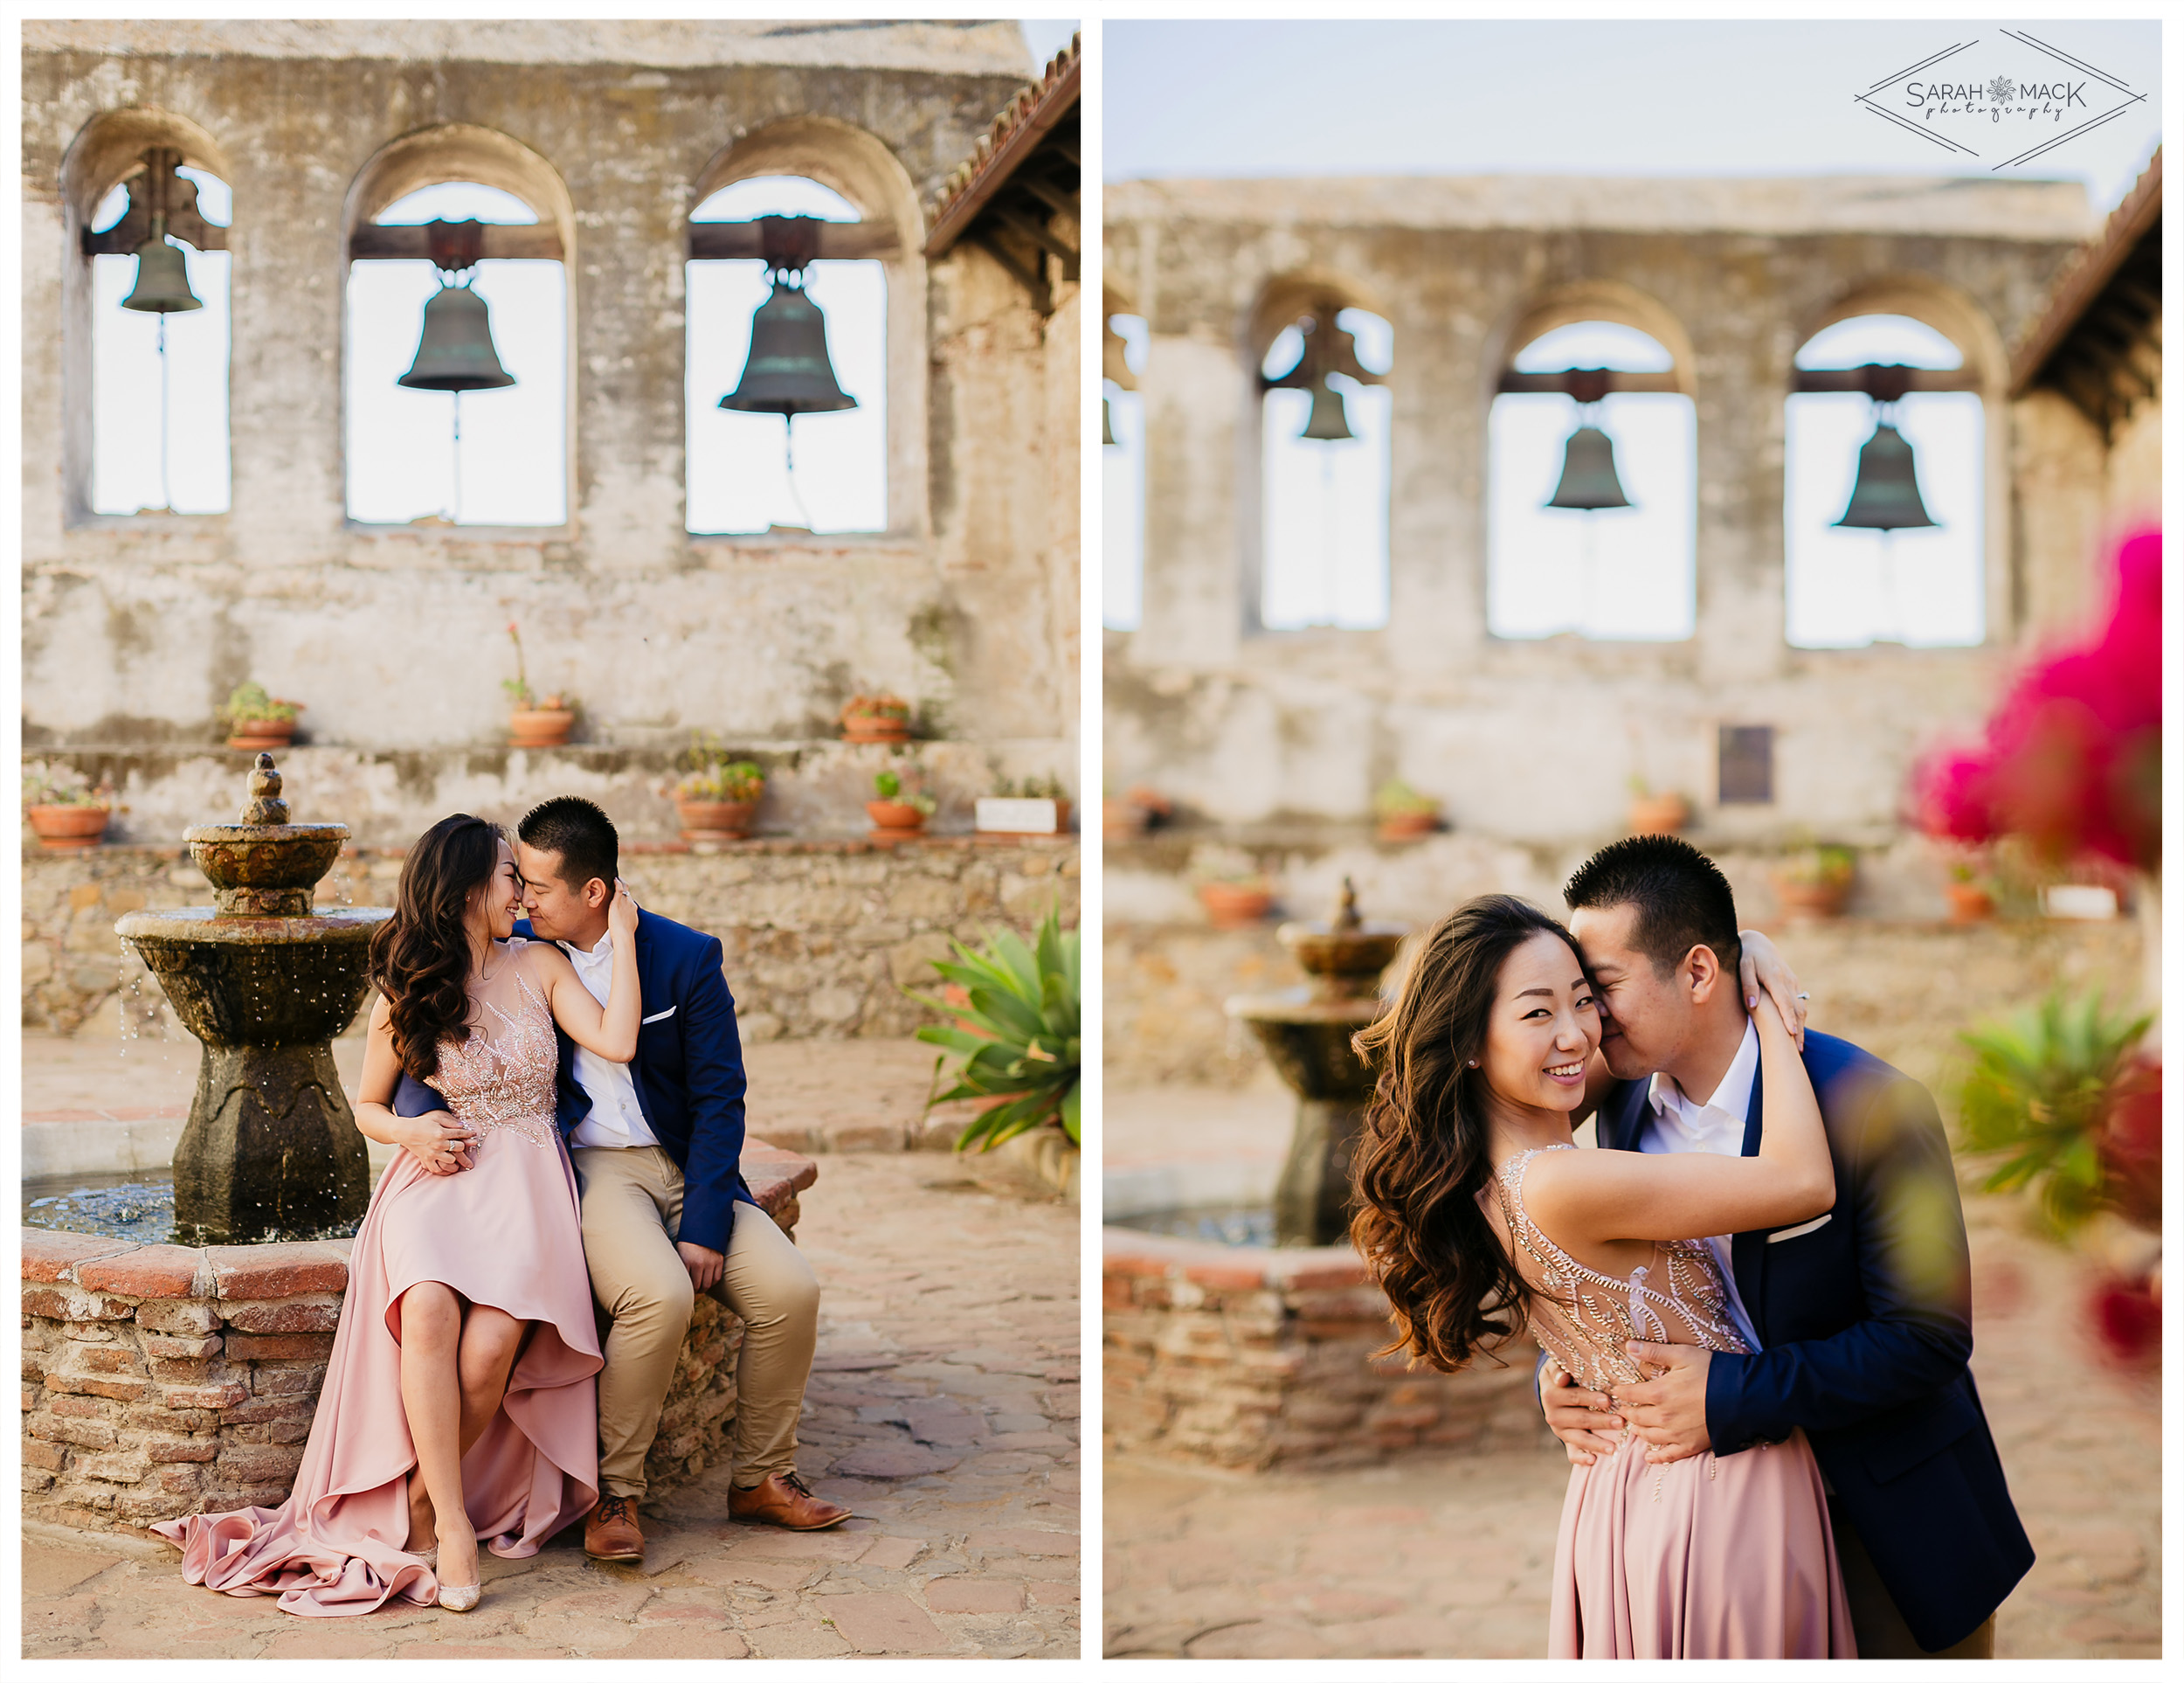 CJ-Mission-San-Juan-Capistrano-Engagement-Photography-12.jpg